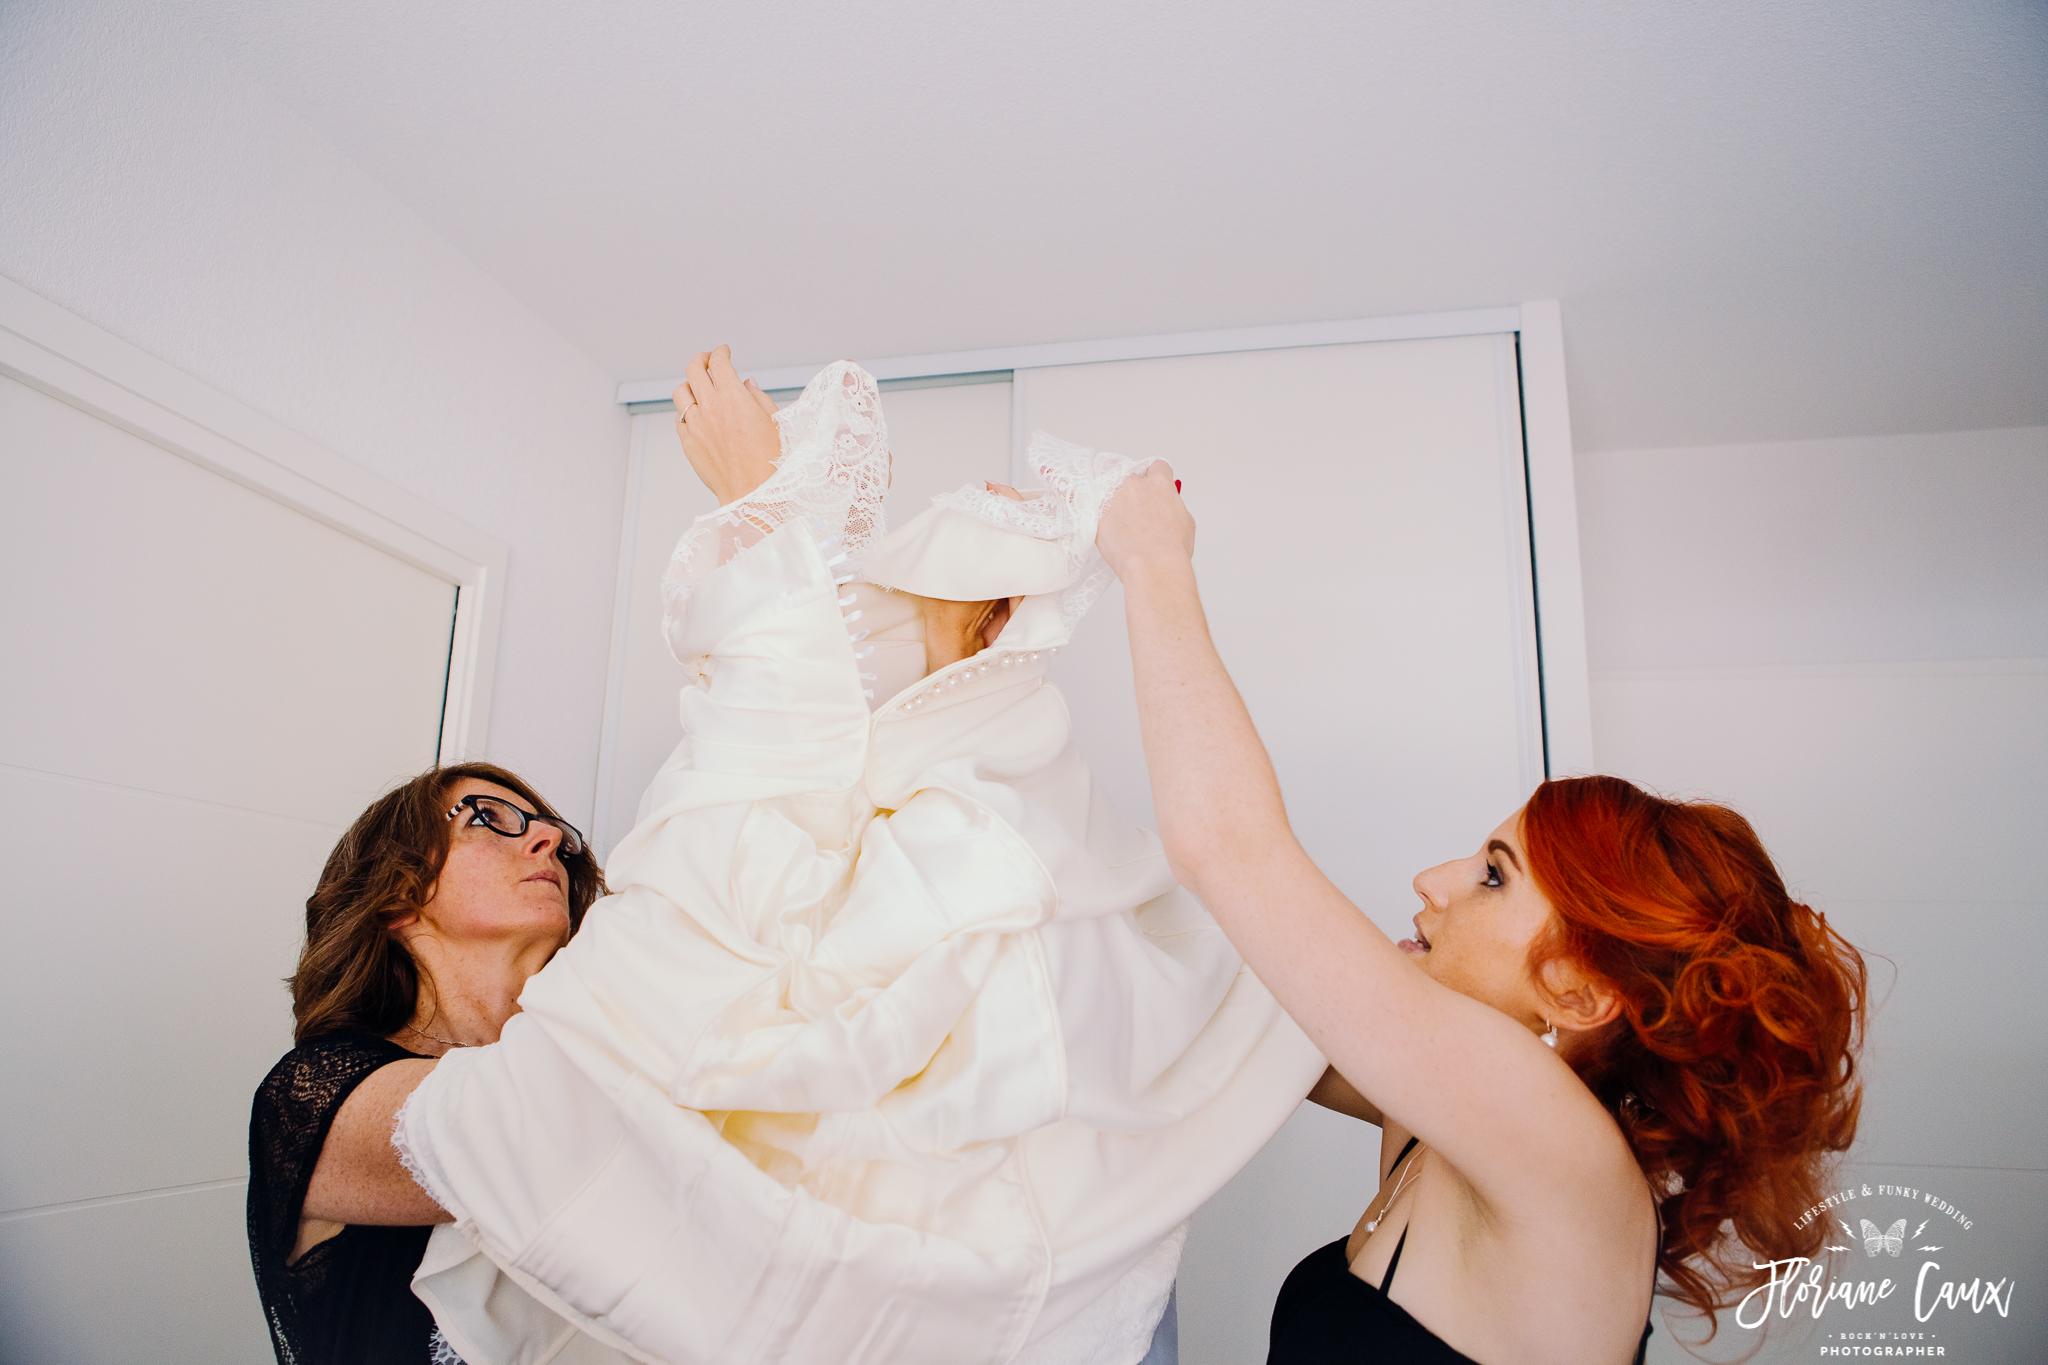 photographe-mariage-toulouse-rocknroll-maries-tatoues-floriane-caux-9